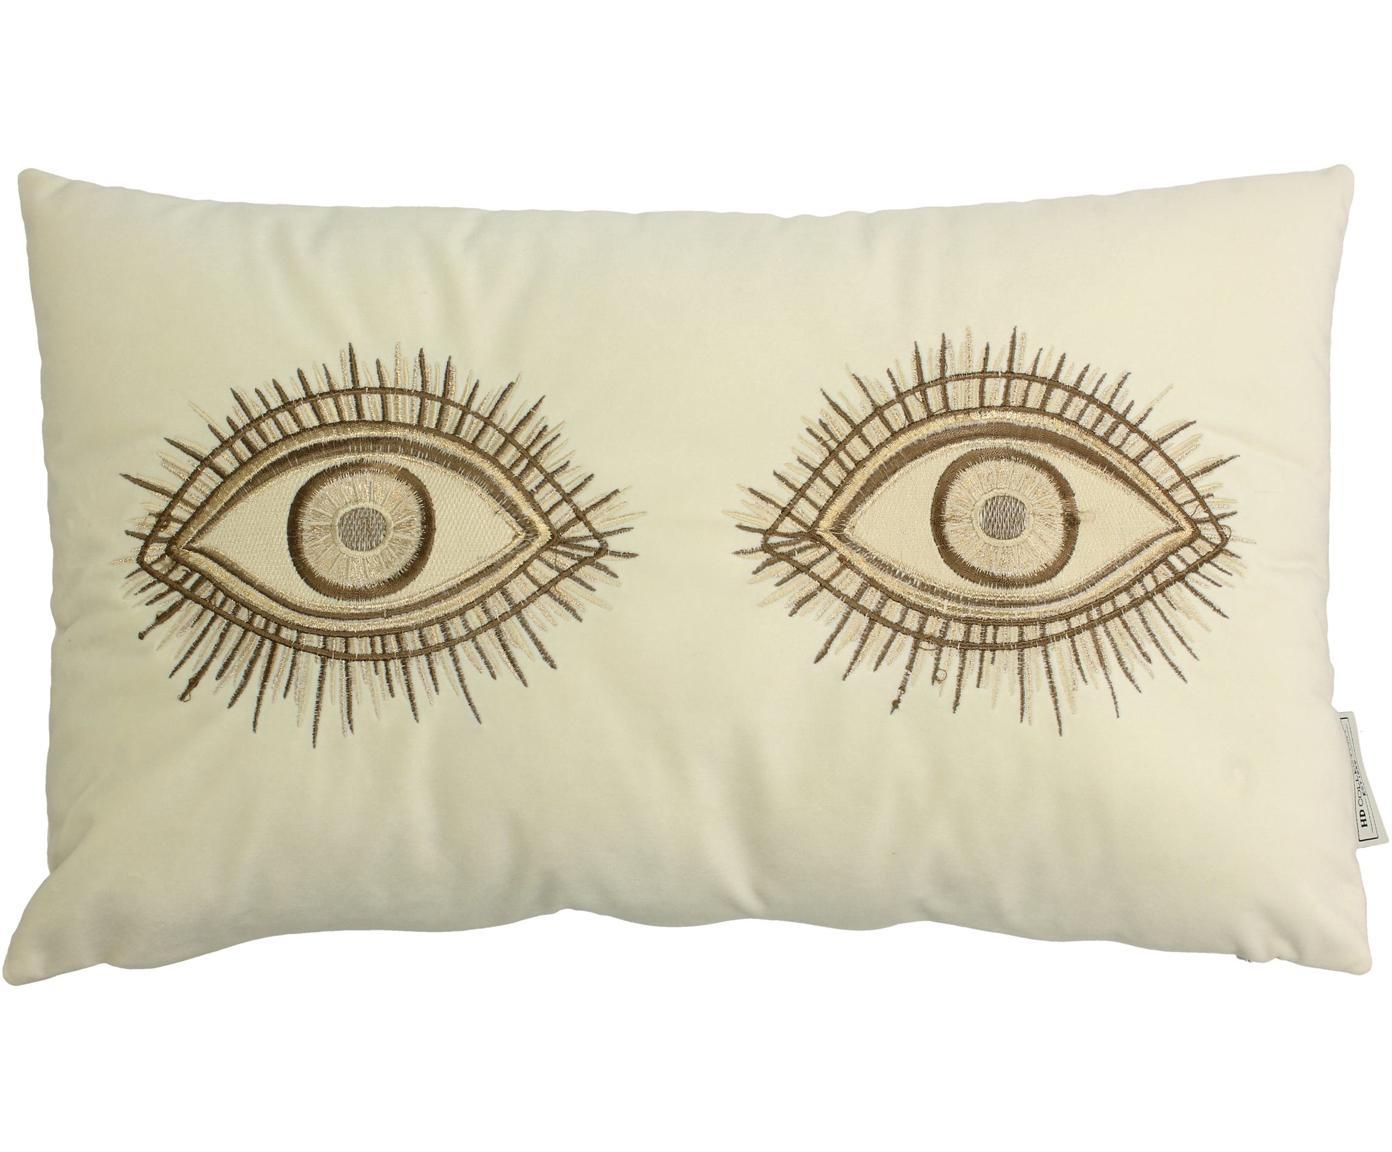 Cuscino in velluto con imbottitura Eyes, Velluto, Avorio, marrone, Larg. 30 x Lung. 50 cm